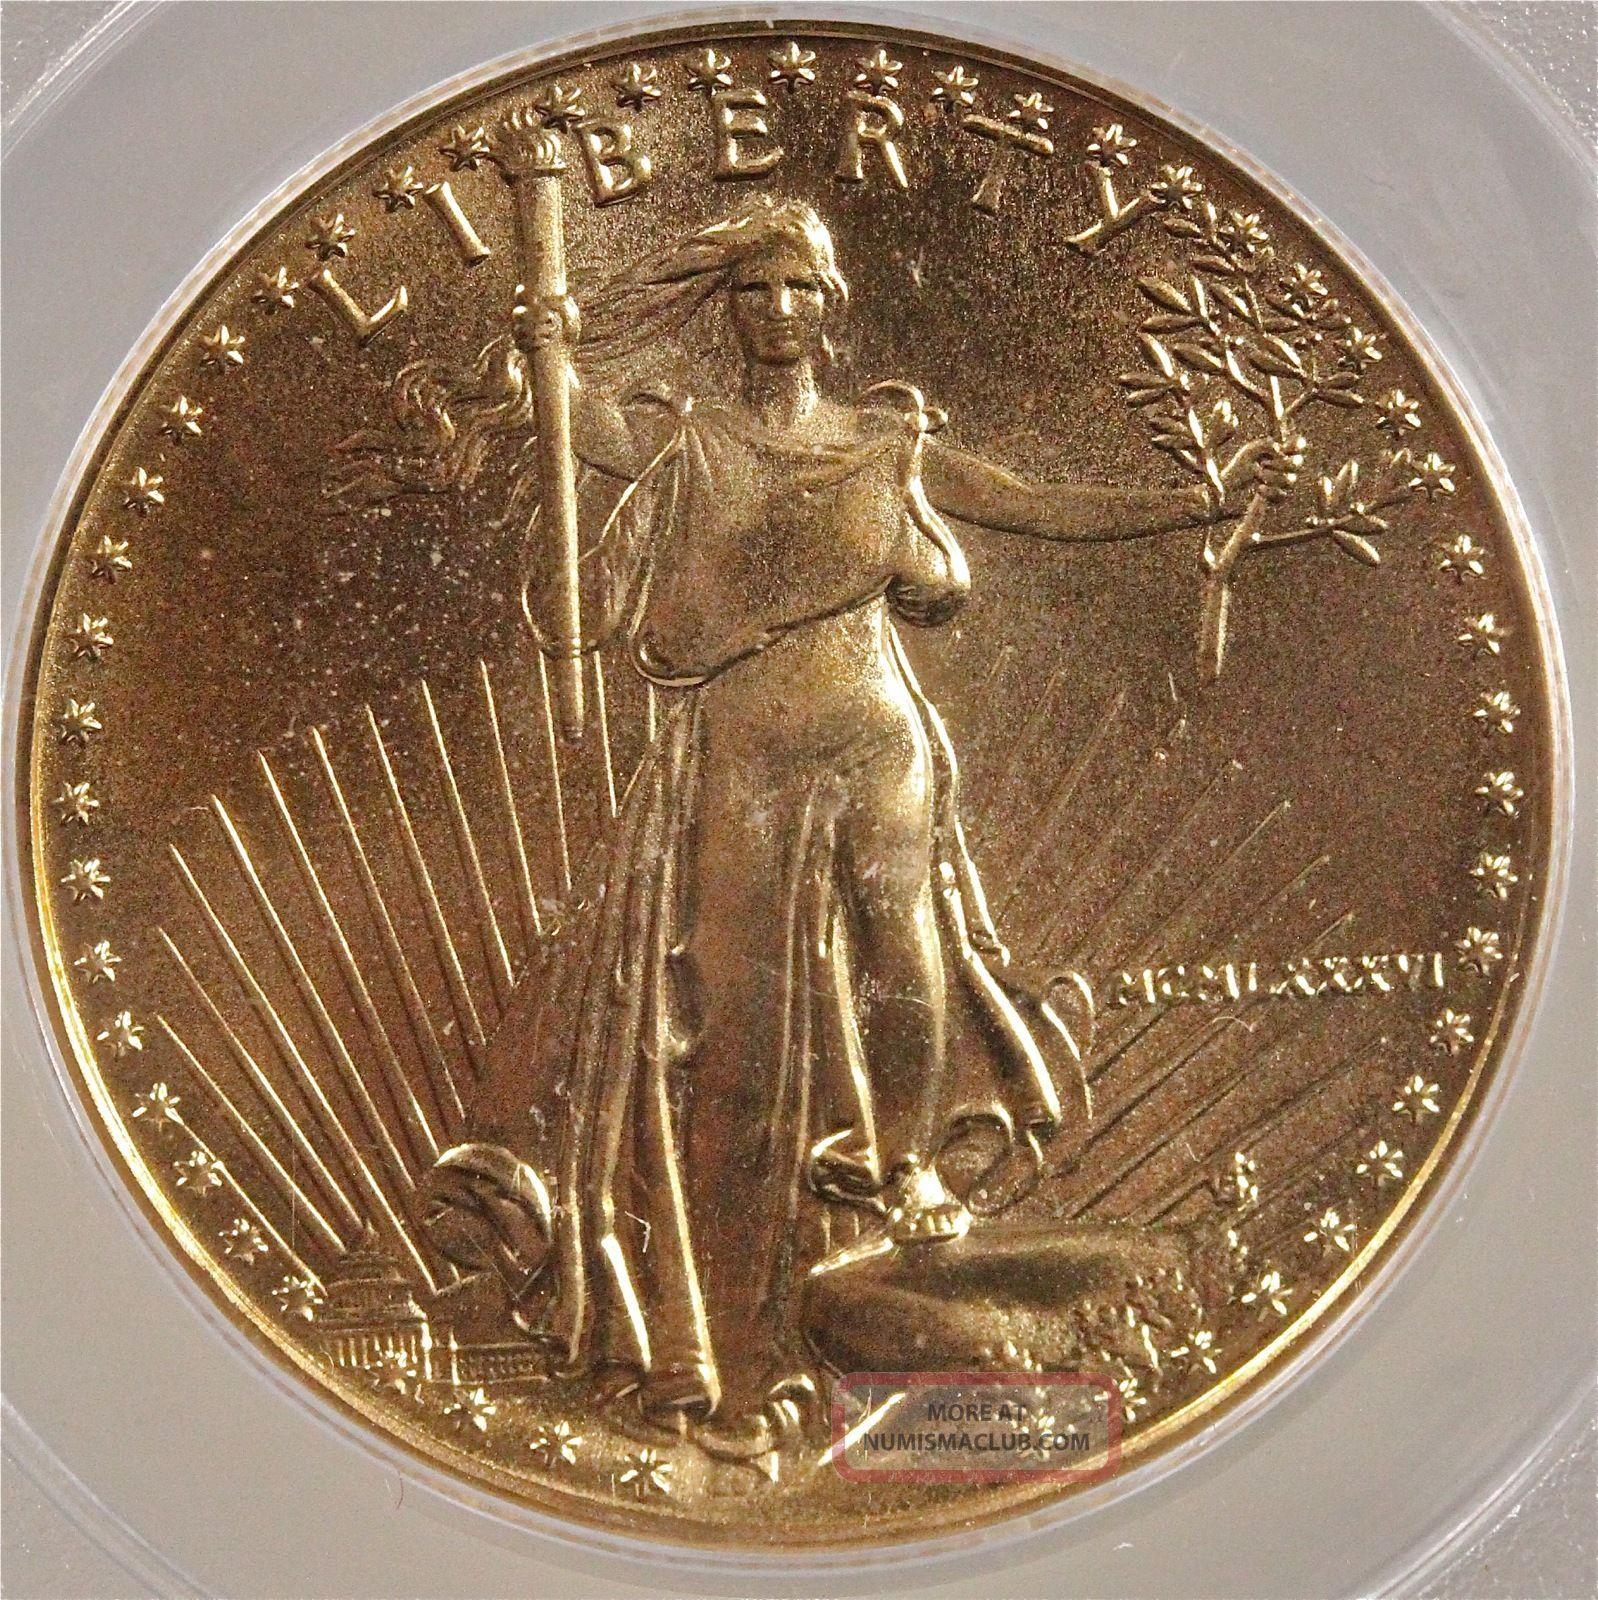 1986 American Gold Eagle Pcgs Ms69 189 Oz Gold 25 Dollar